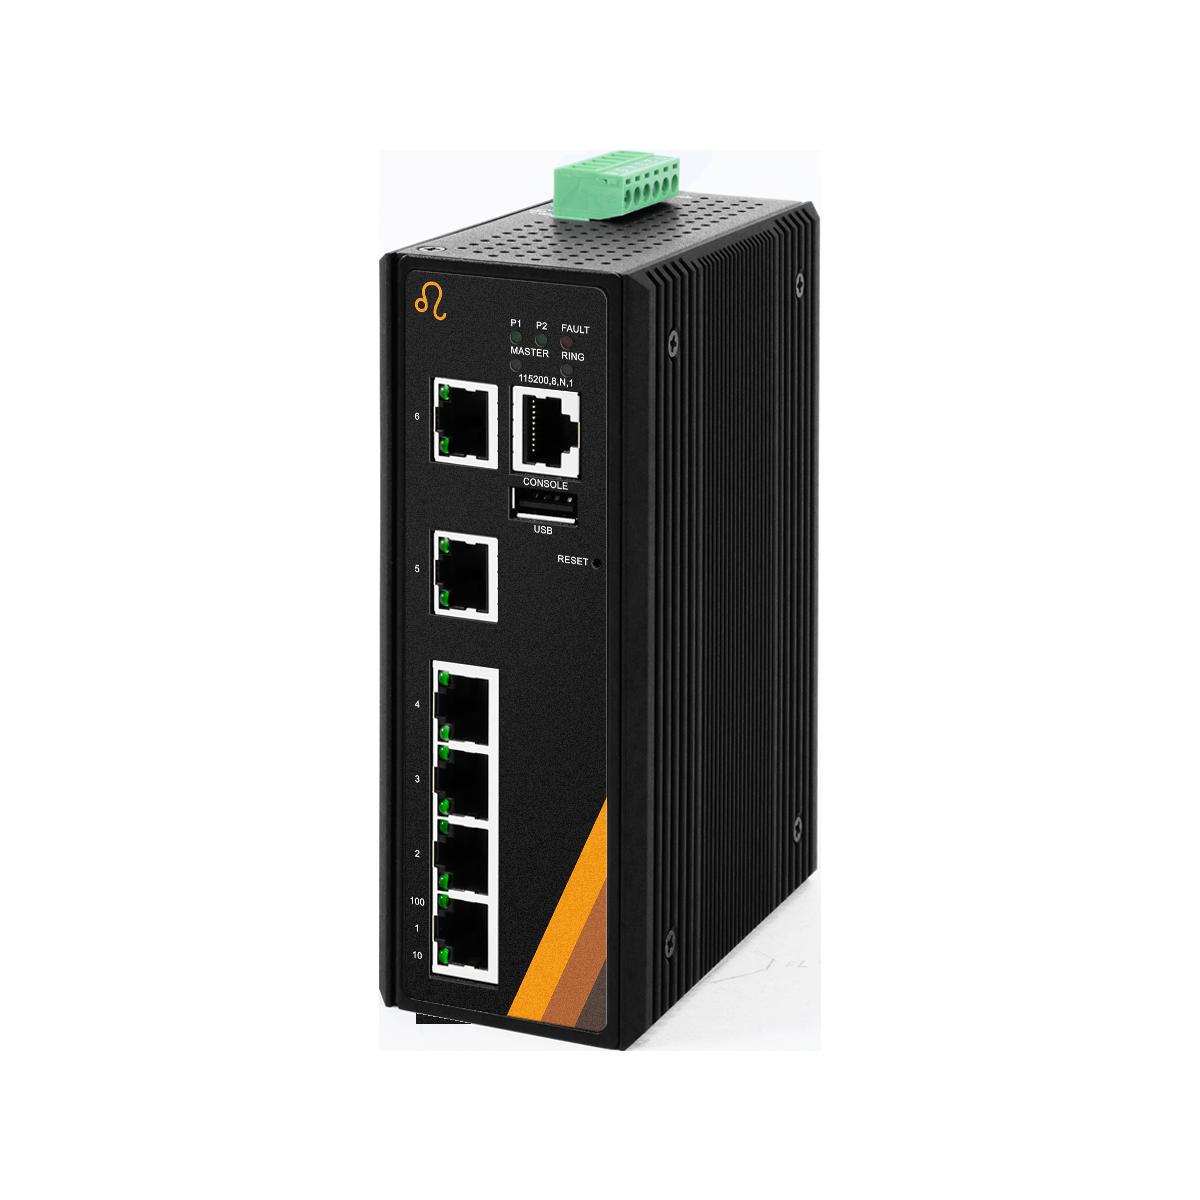 6-Port Industrial Managed Ethernet Switch - 6*10/100Tx-ET5